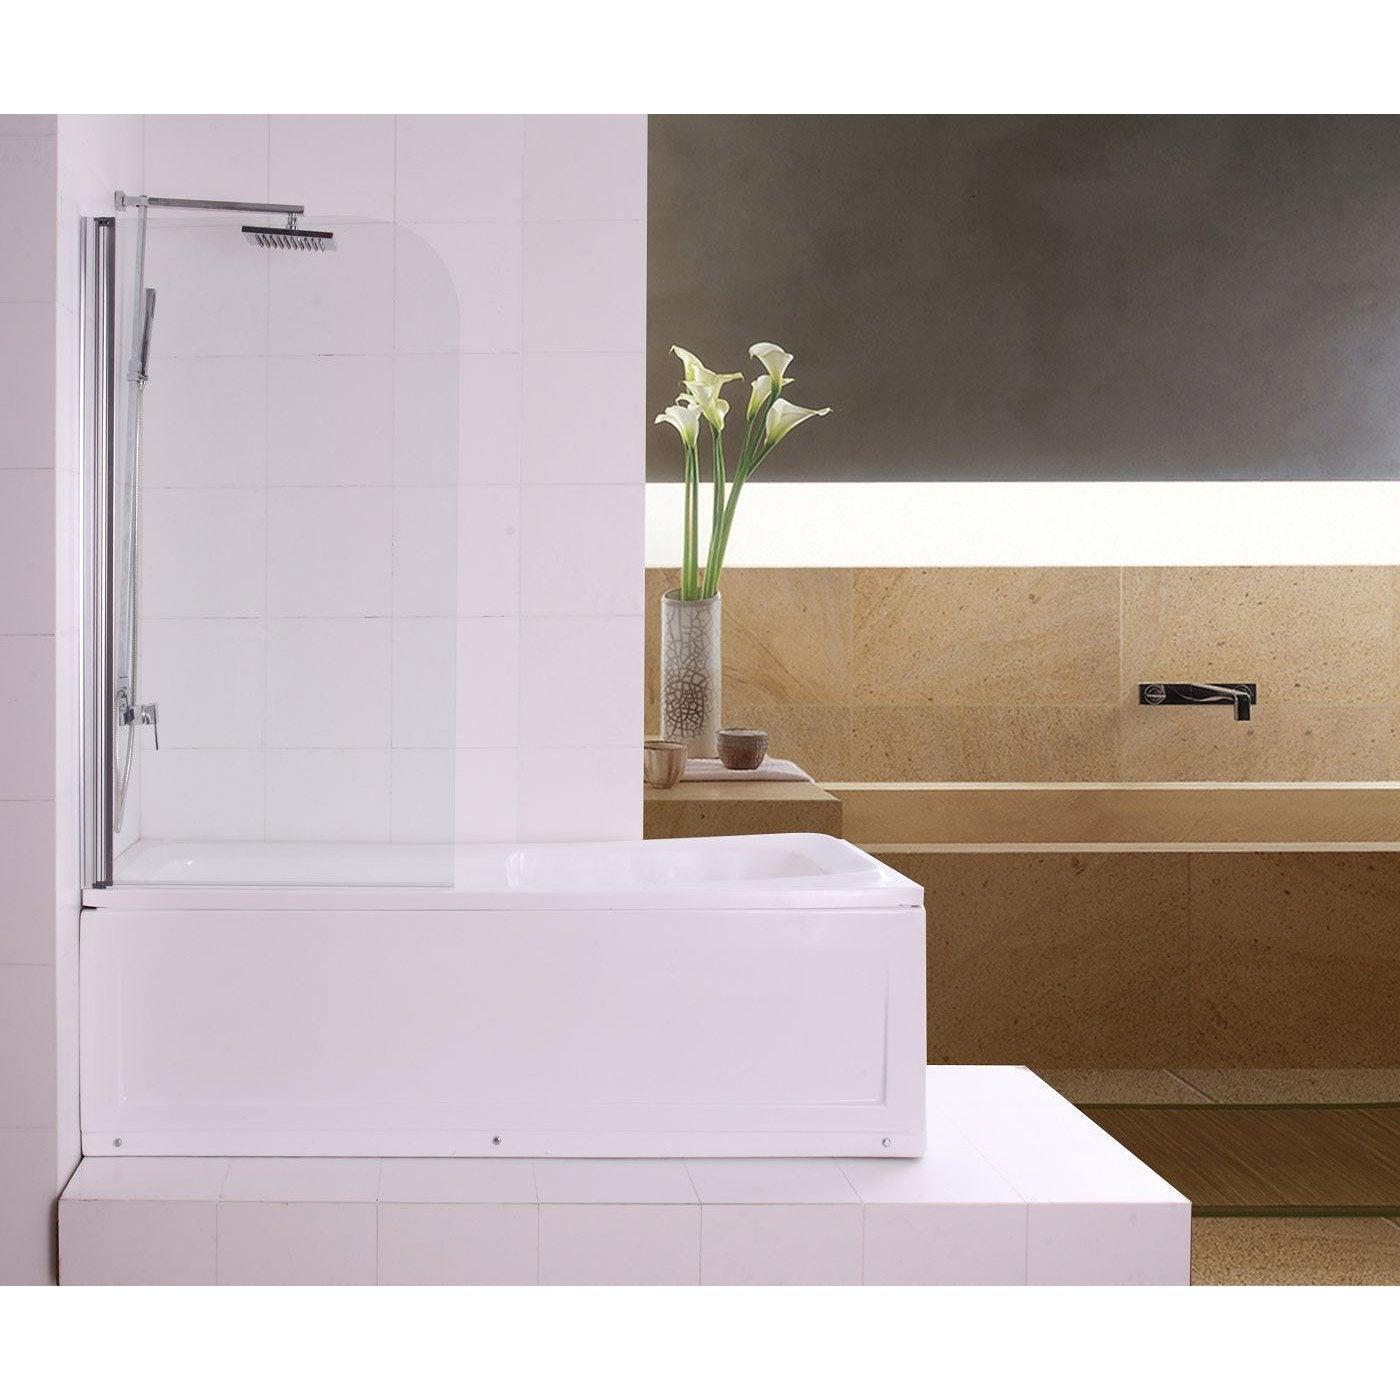 porte baignoire leroy merlin excellent beautiful pare. Black Bedroom Furniture Sets. Home Design Ideas